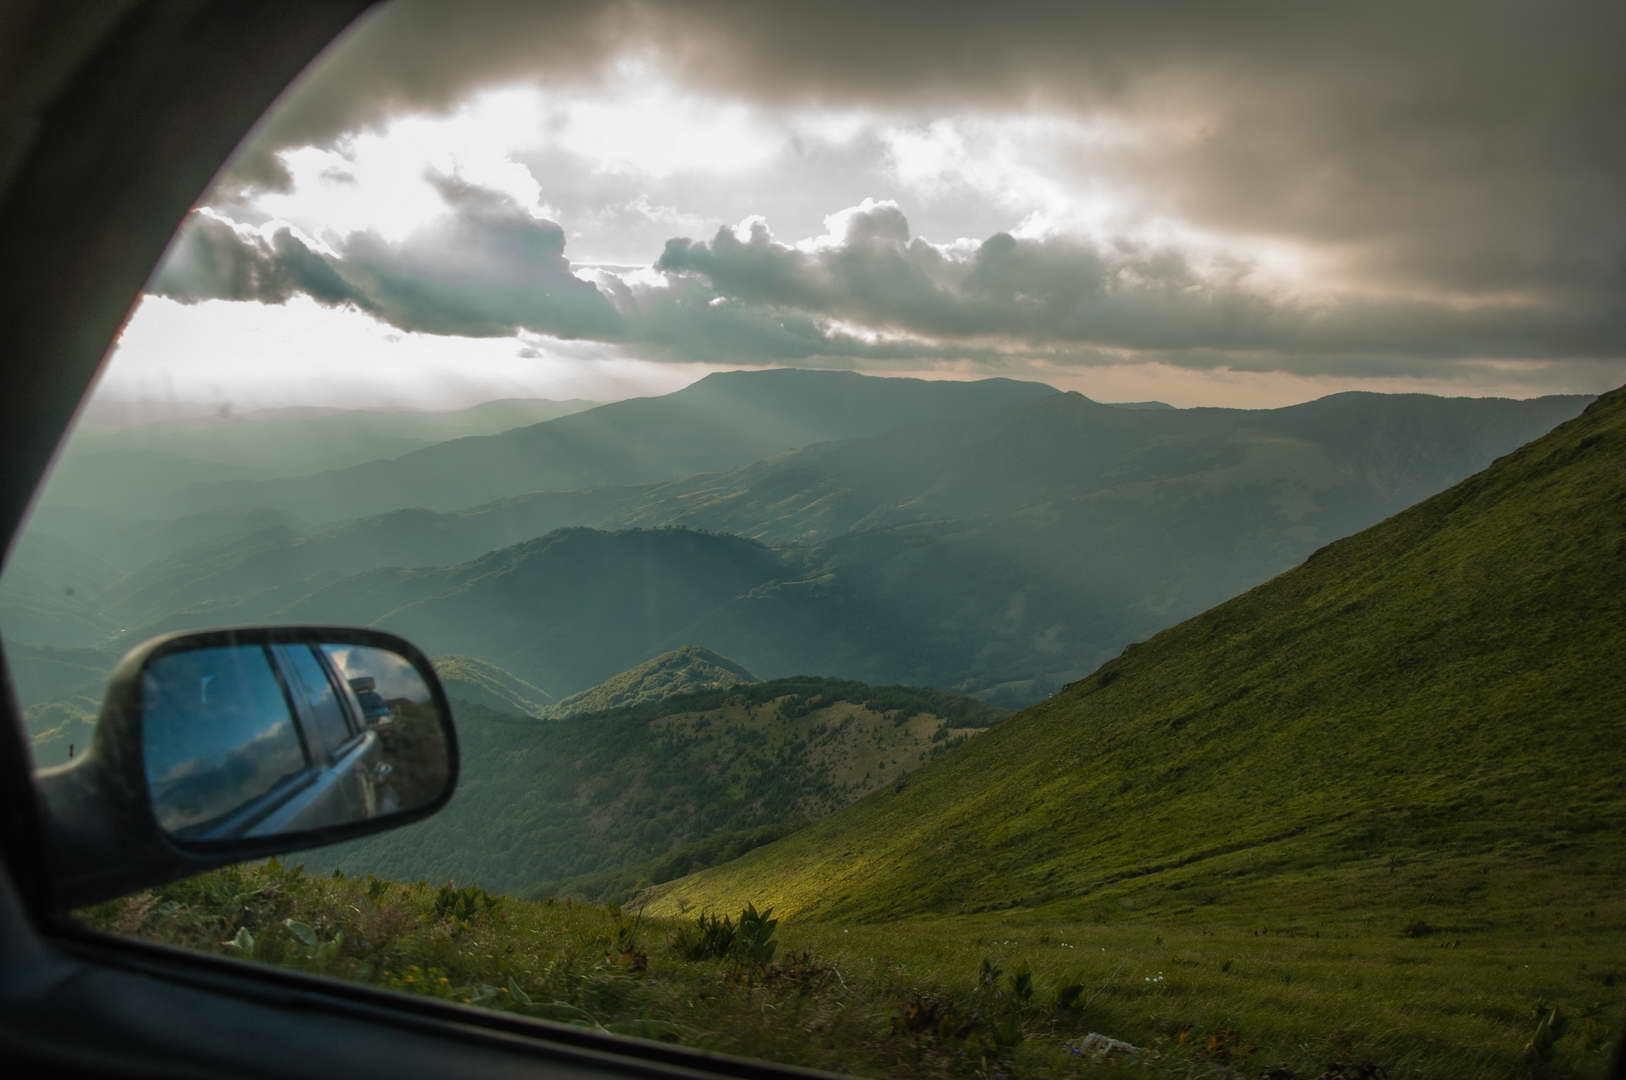 Kroz prozor niz planinu